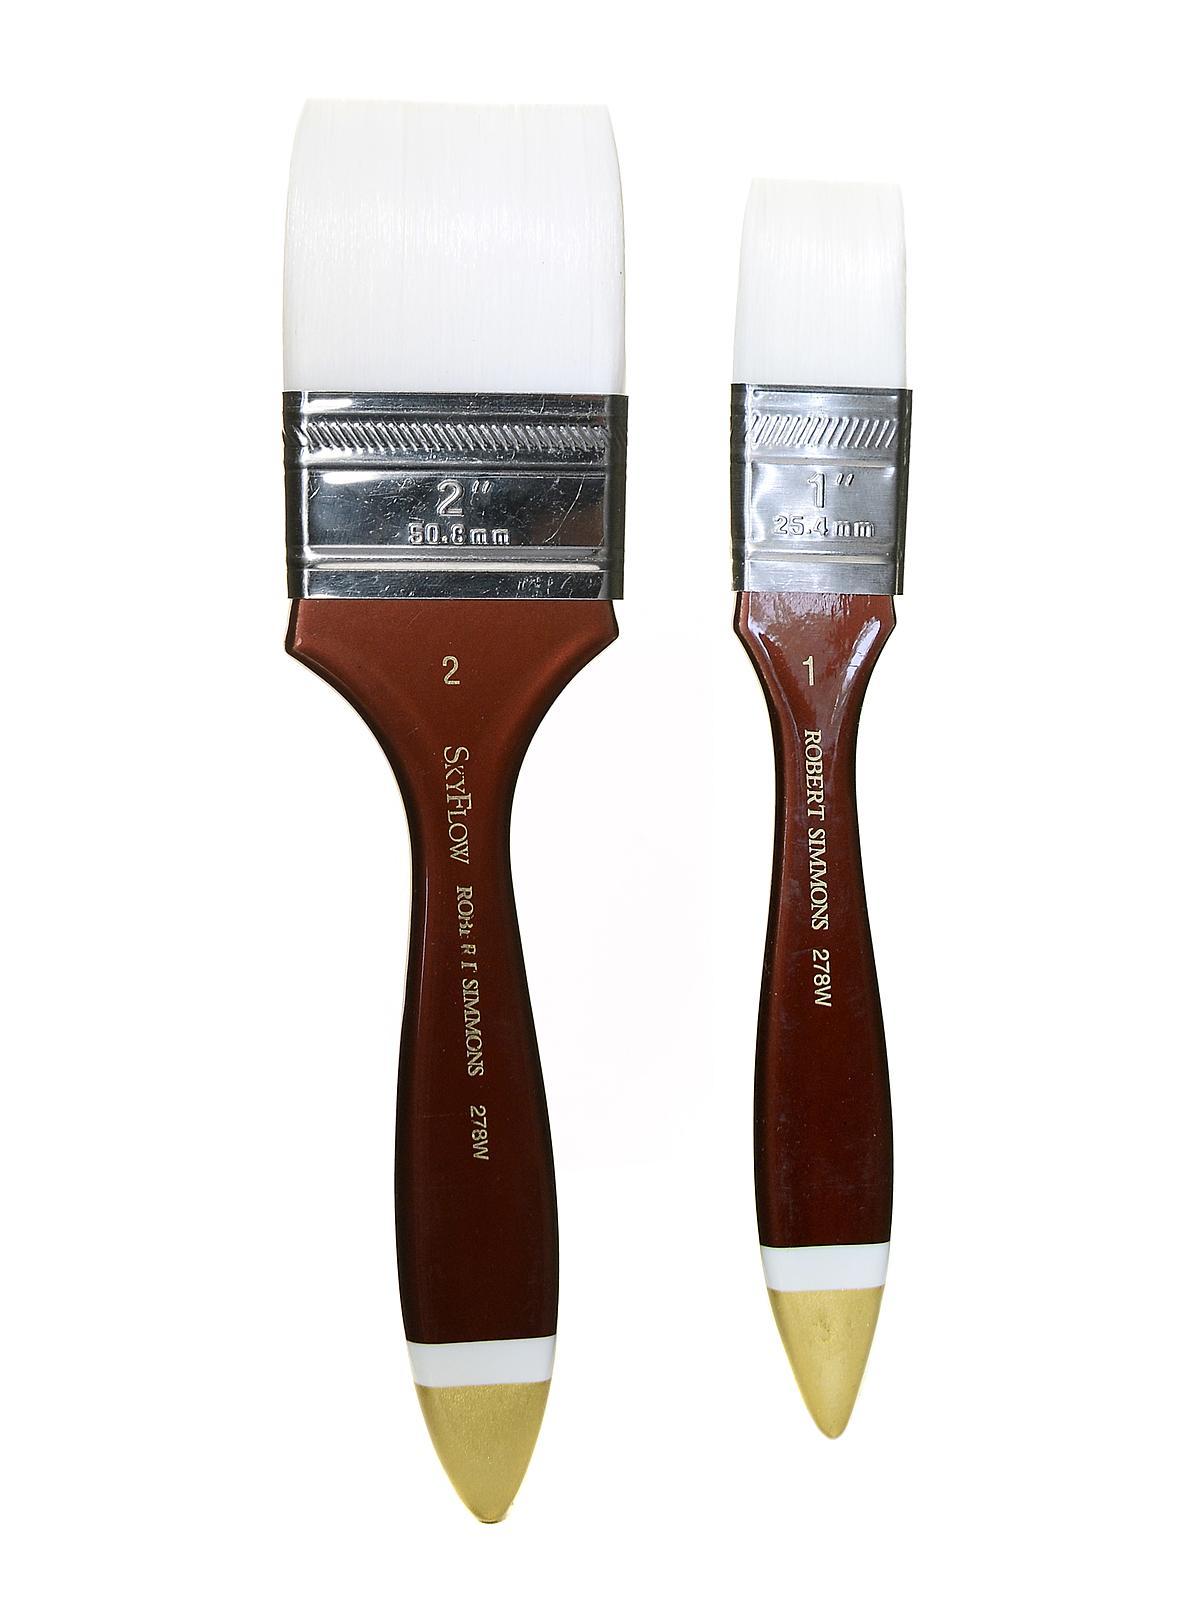 Robert Simmons White Sable Short Handle Brushes 10 round 785